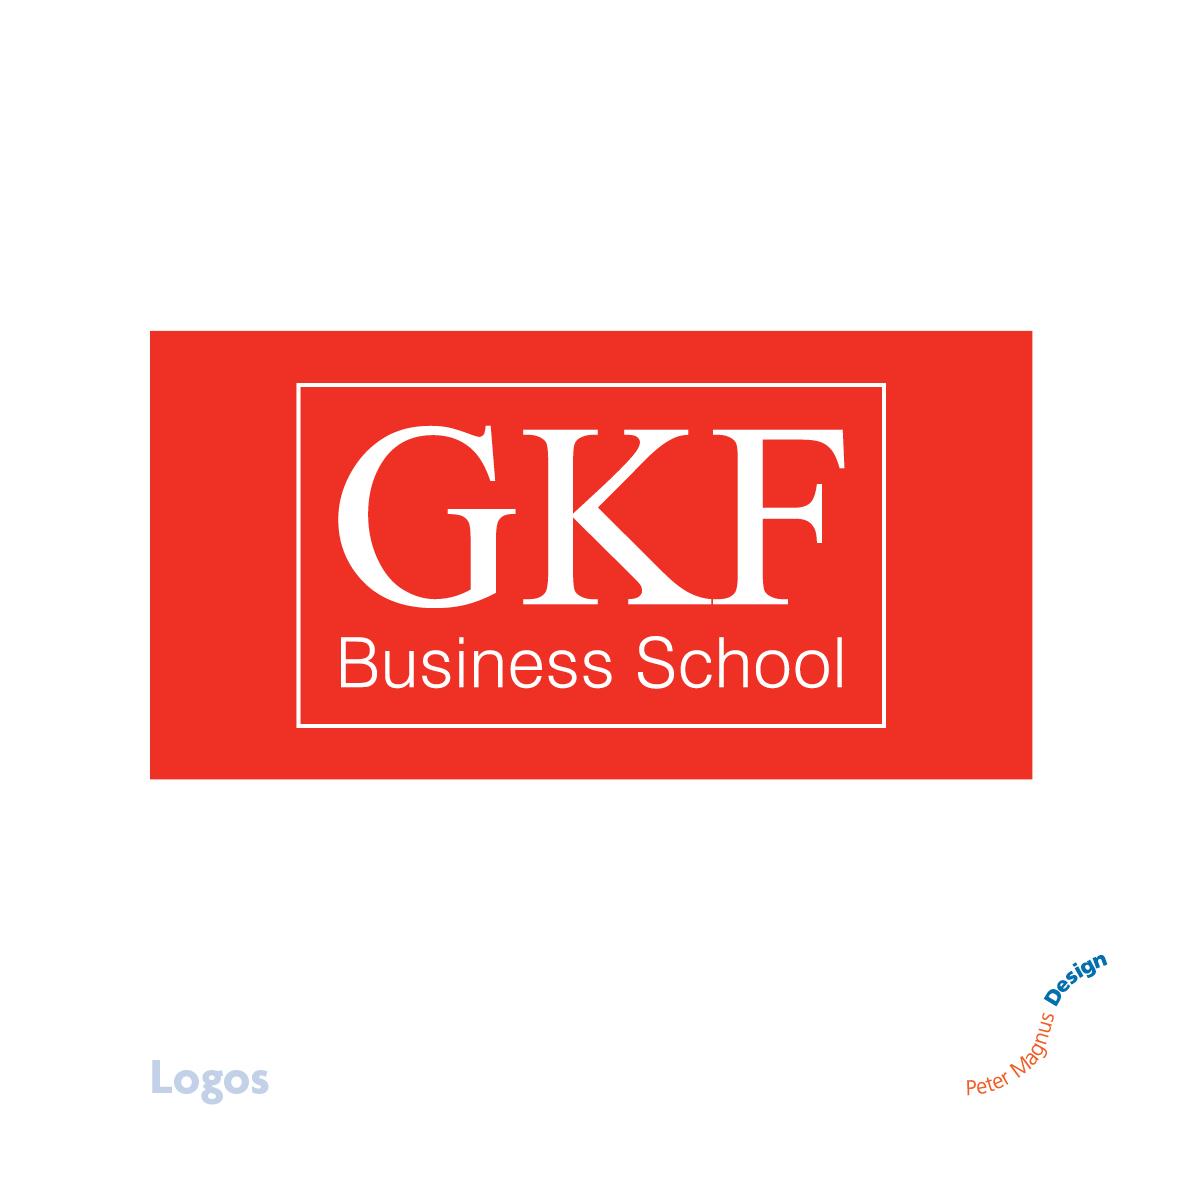 GKF Business School logo, Watford, Herts